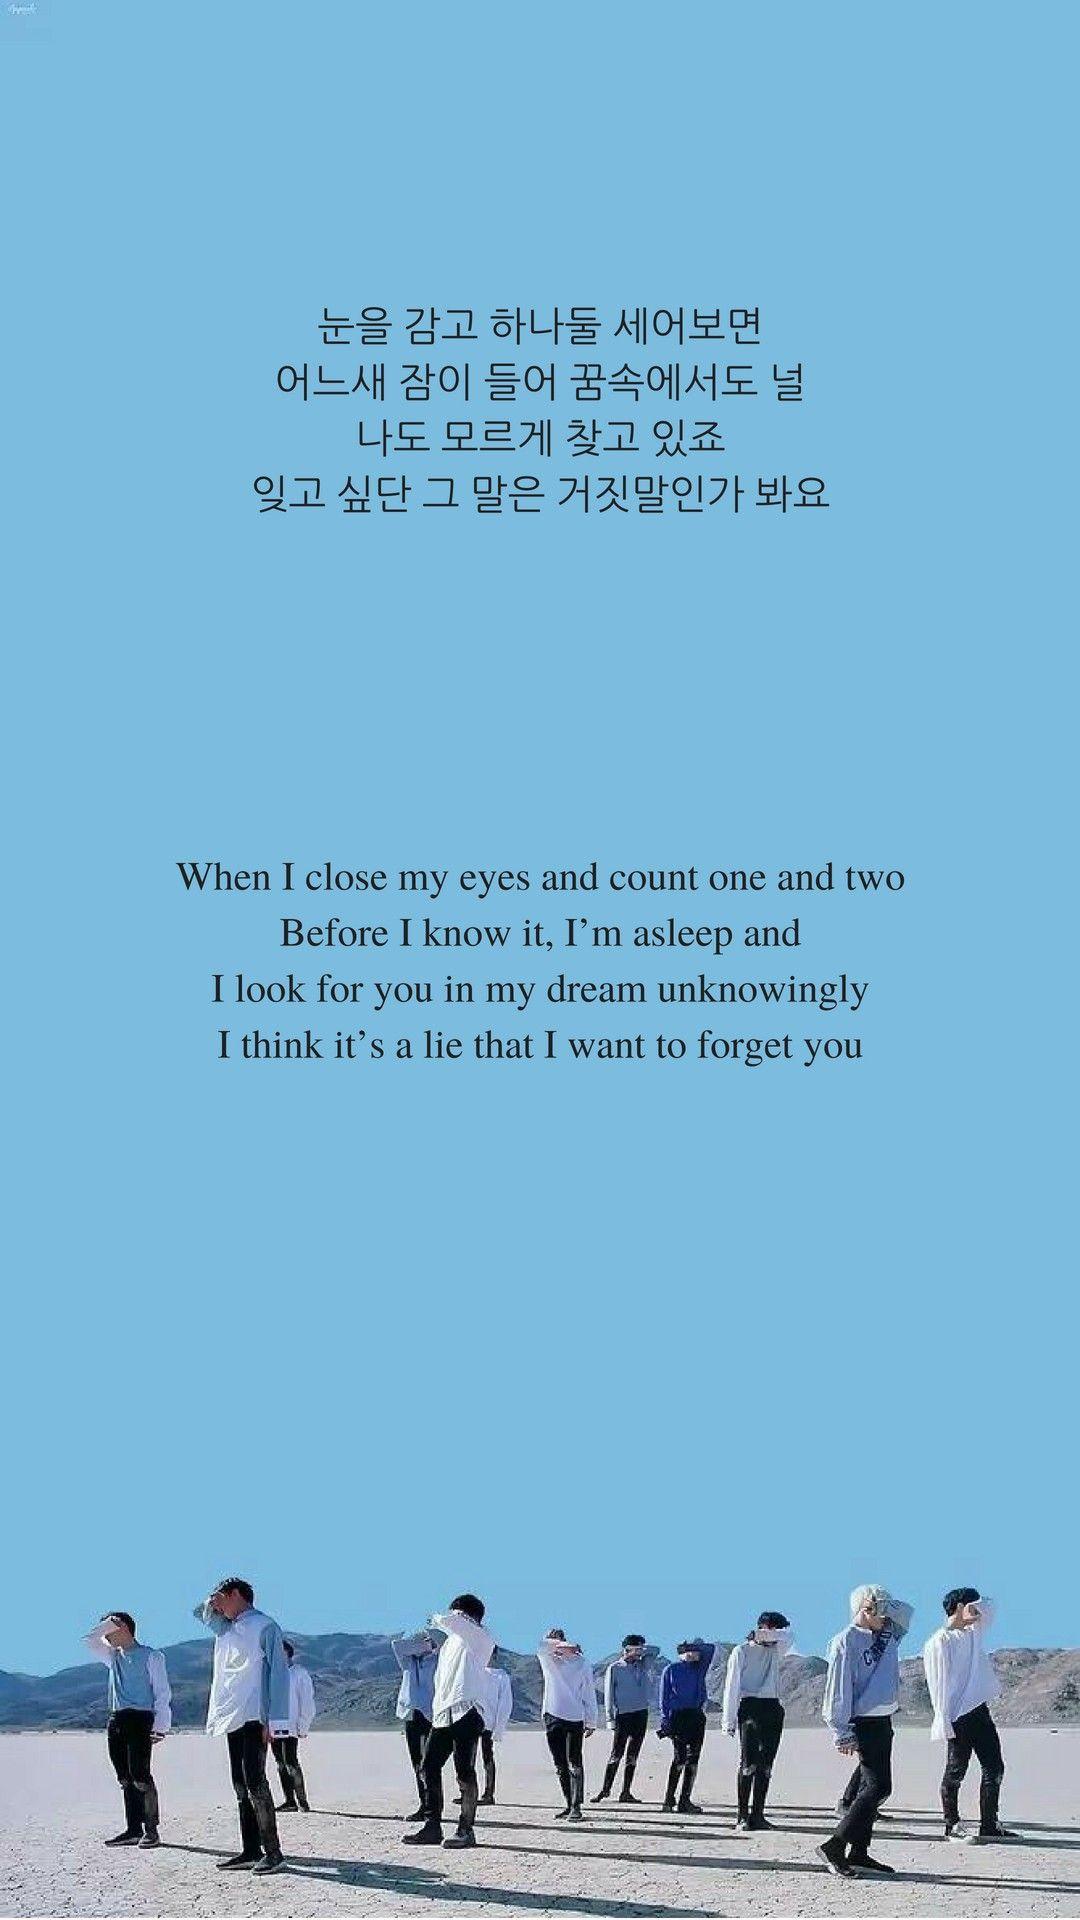 Habit Seventeen Lyrics Wallpaper Kutipan Lagu Kutipan Lirik Kutipan Lucu